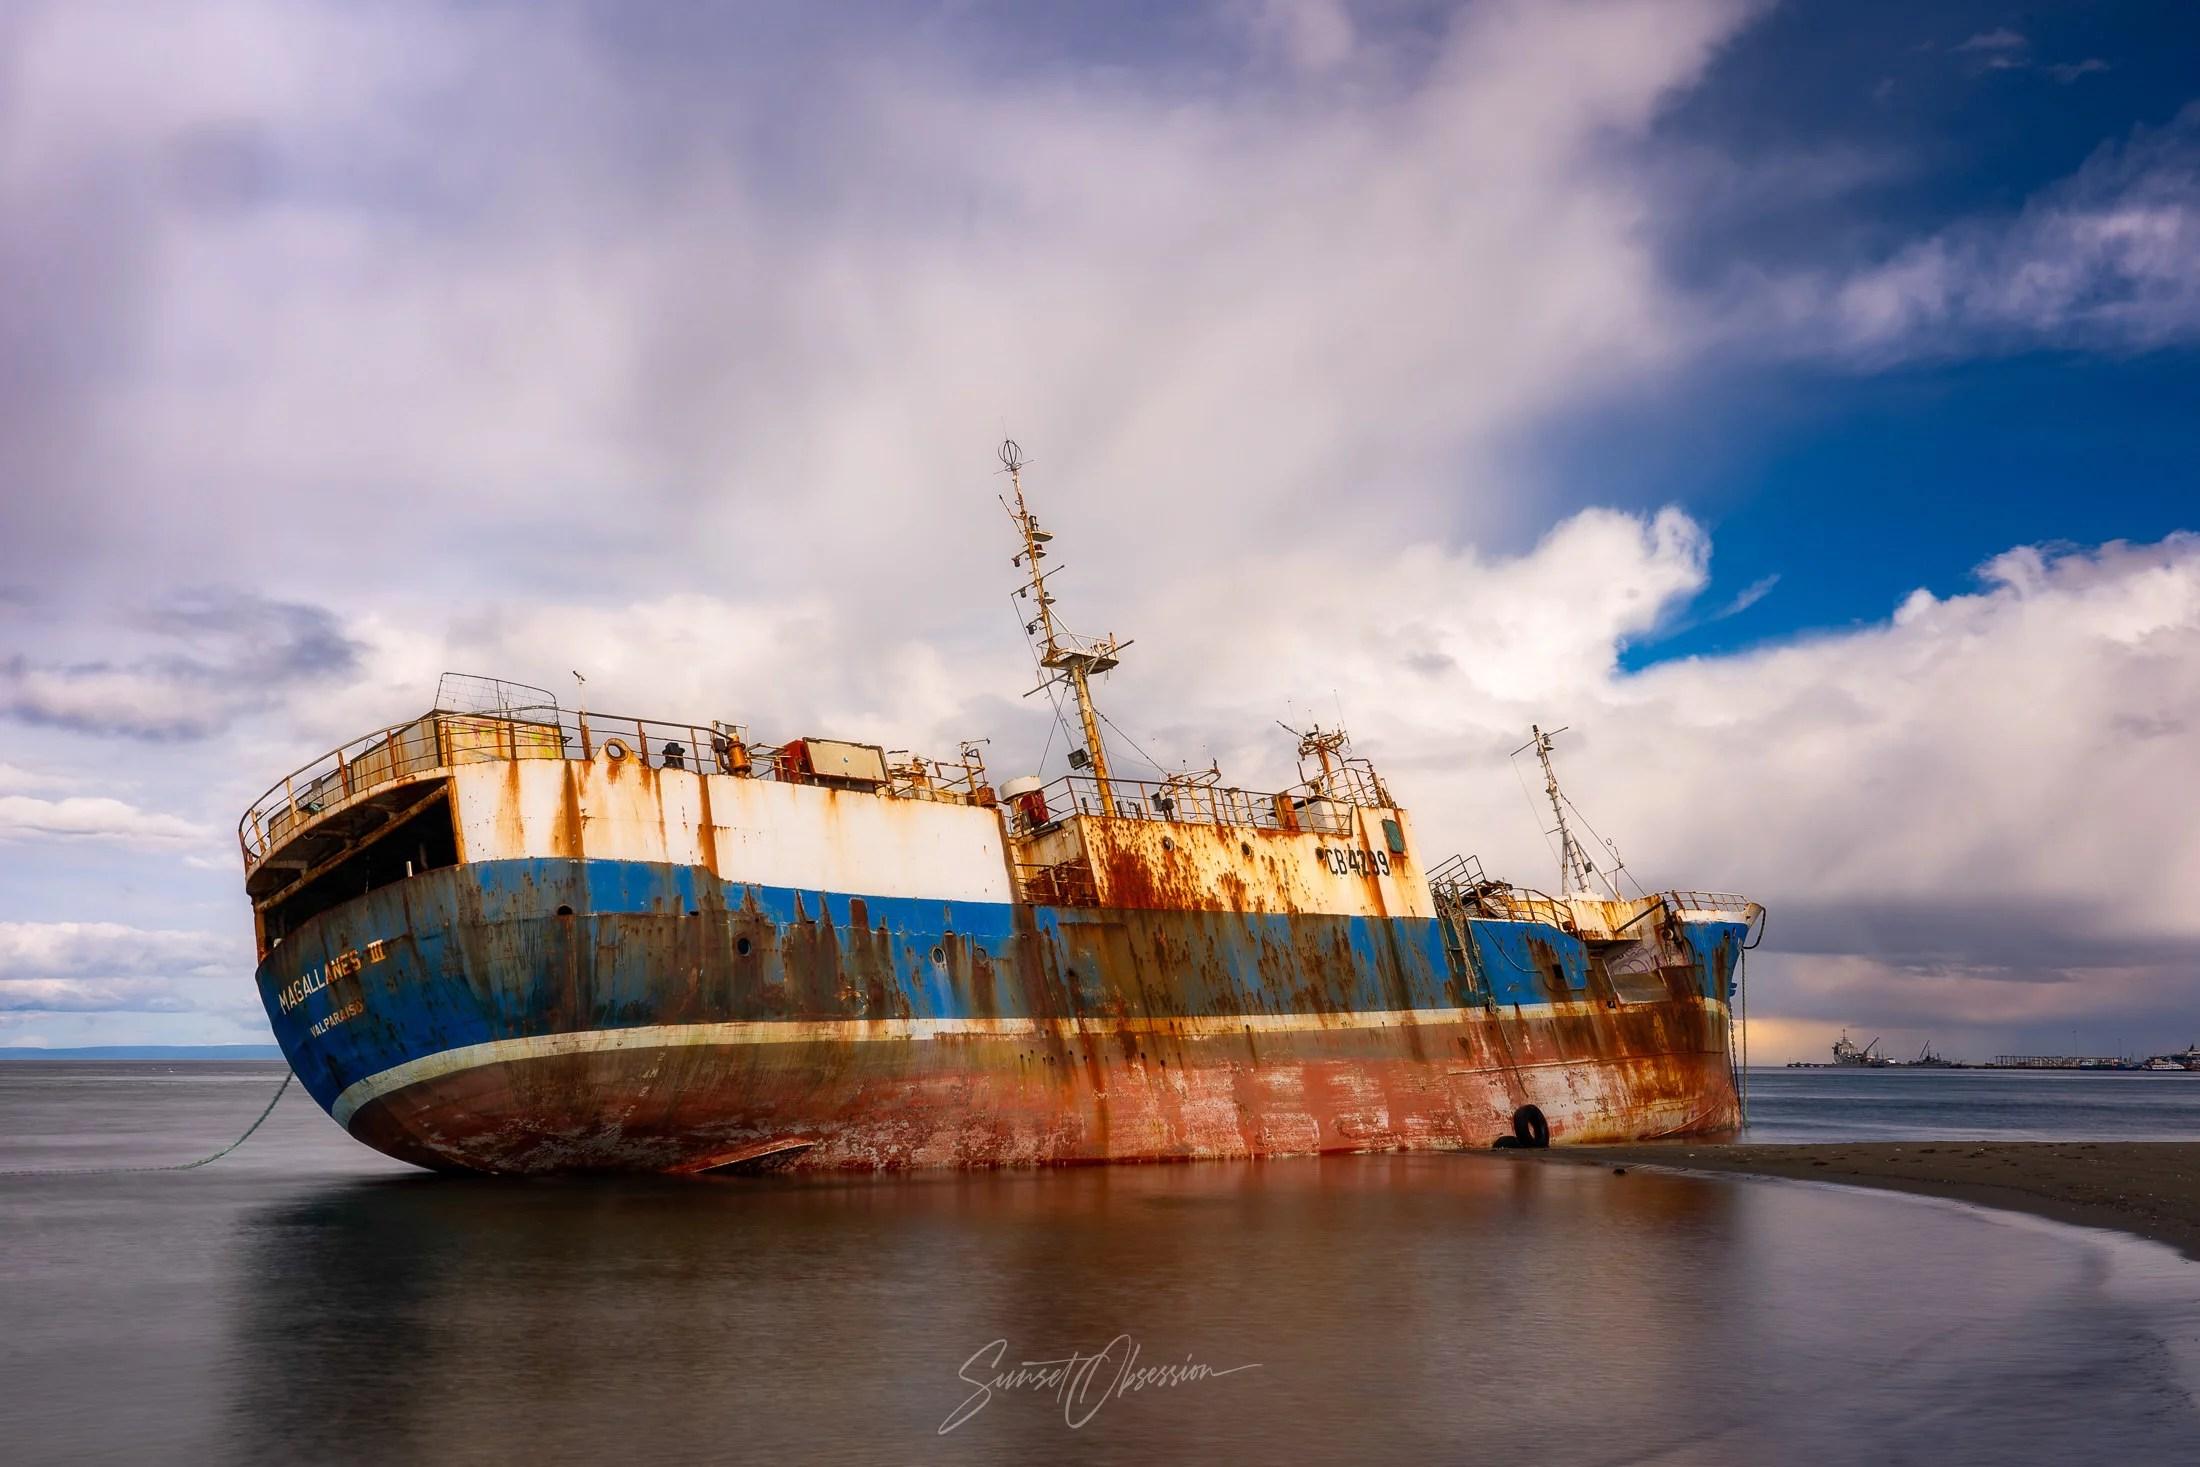 The shipwreck of Magallanes III in Punta Arenas